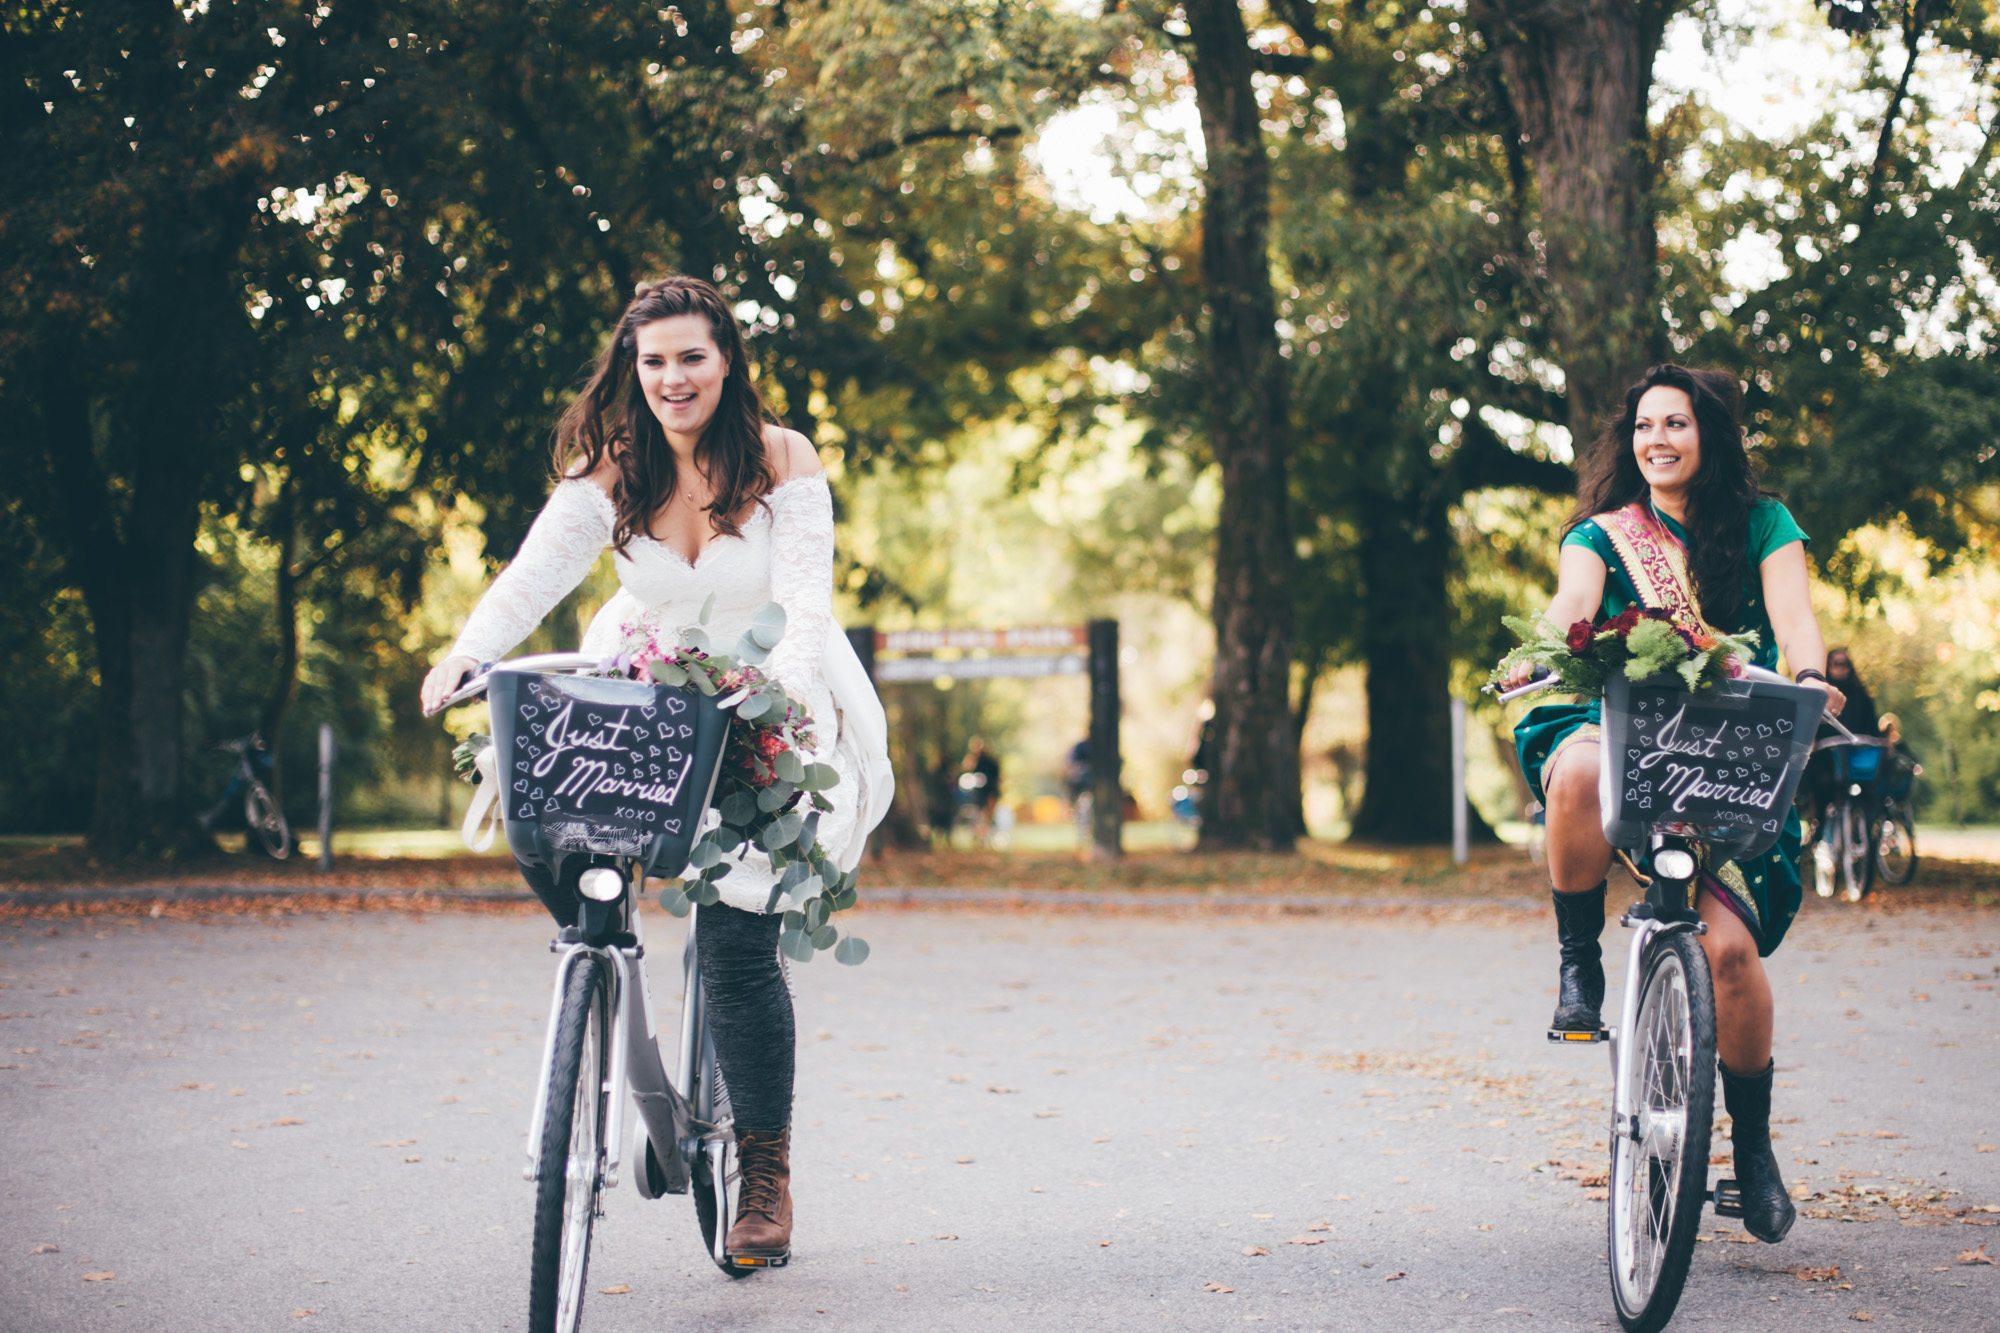 Newlyweds Kaitlin Straker and Leah Day on Mobi bikes (Kateland Abbigail Clarke)